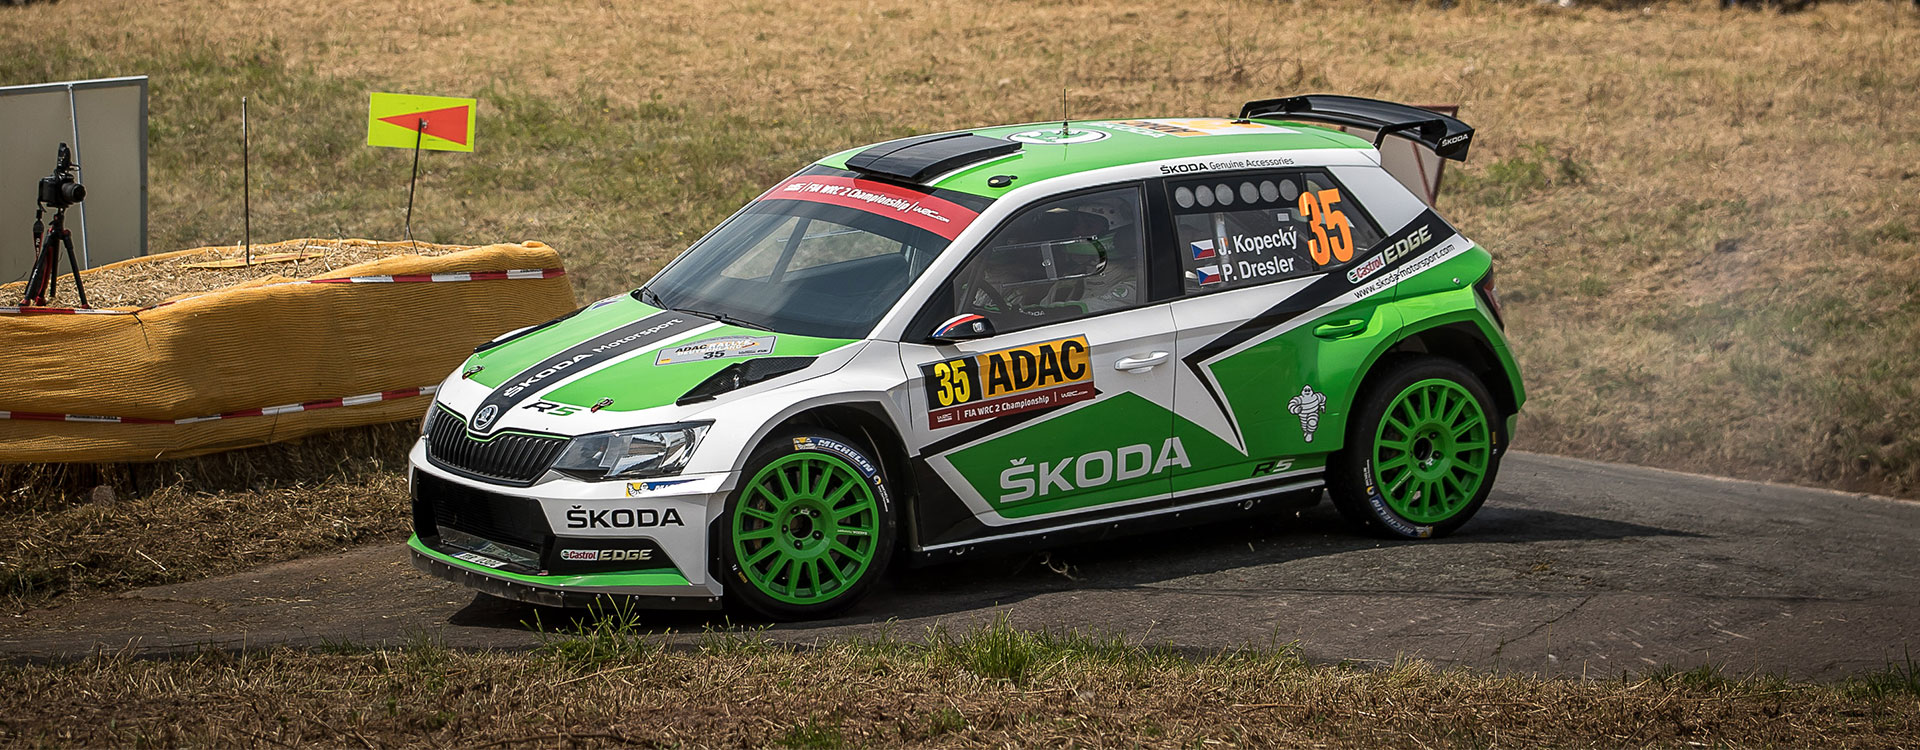 WRC France: Jan Kopecký aims to continue winning sequence for ŠKODA